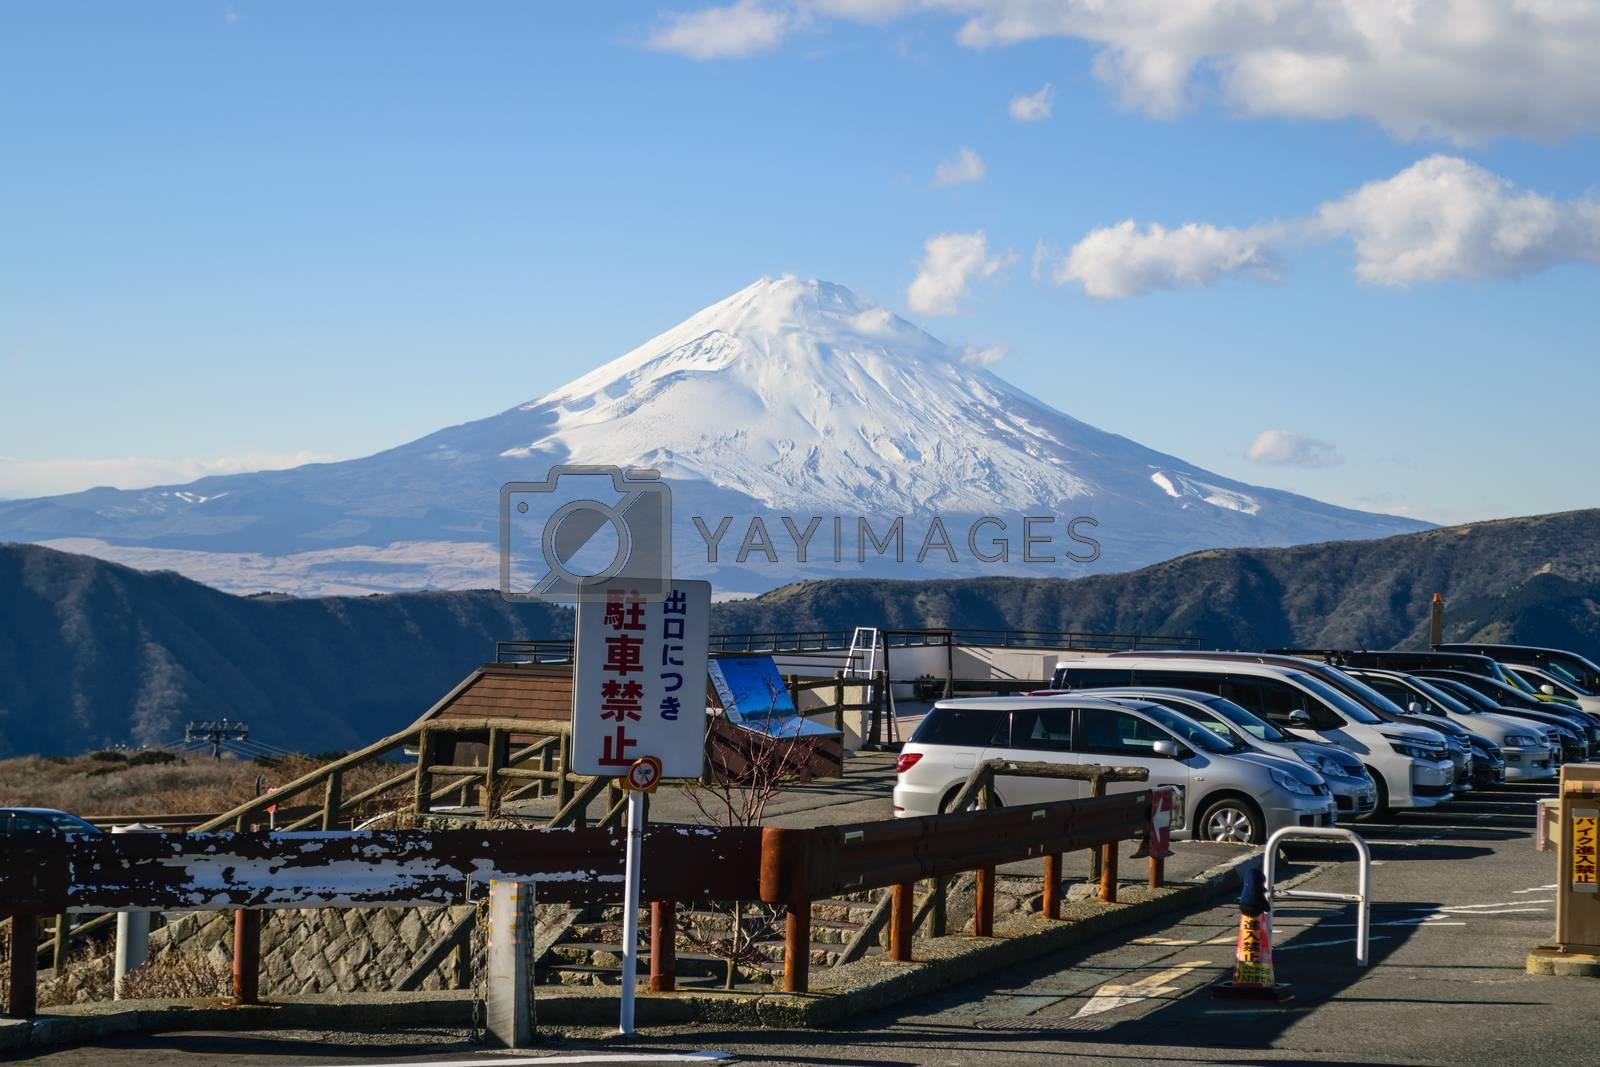 Skyline Mount Fuji. by wattanaphob